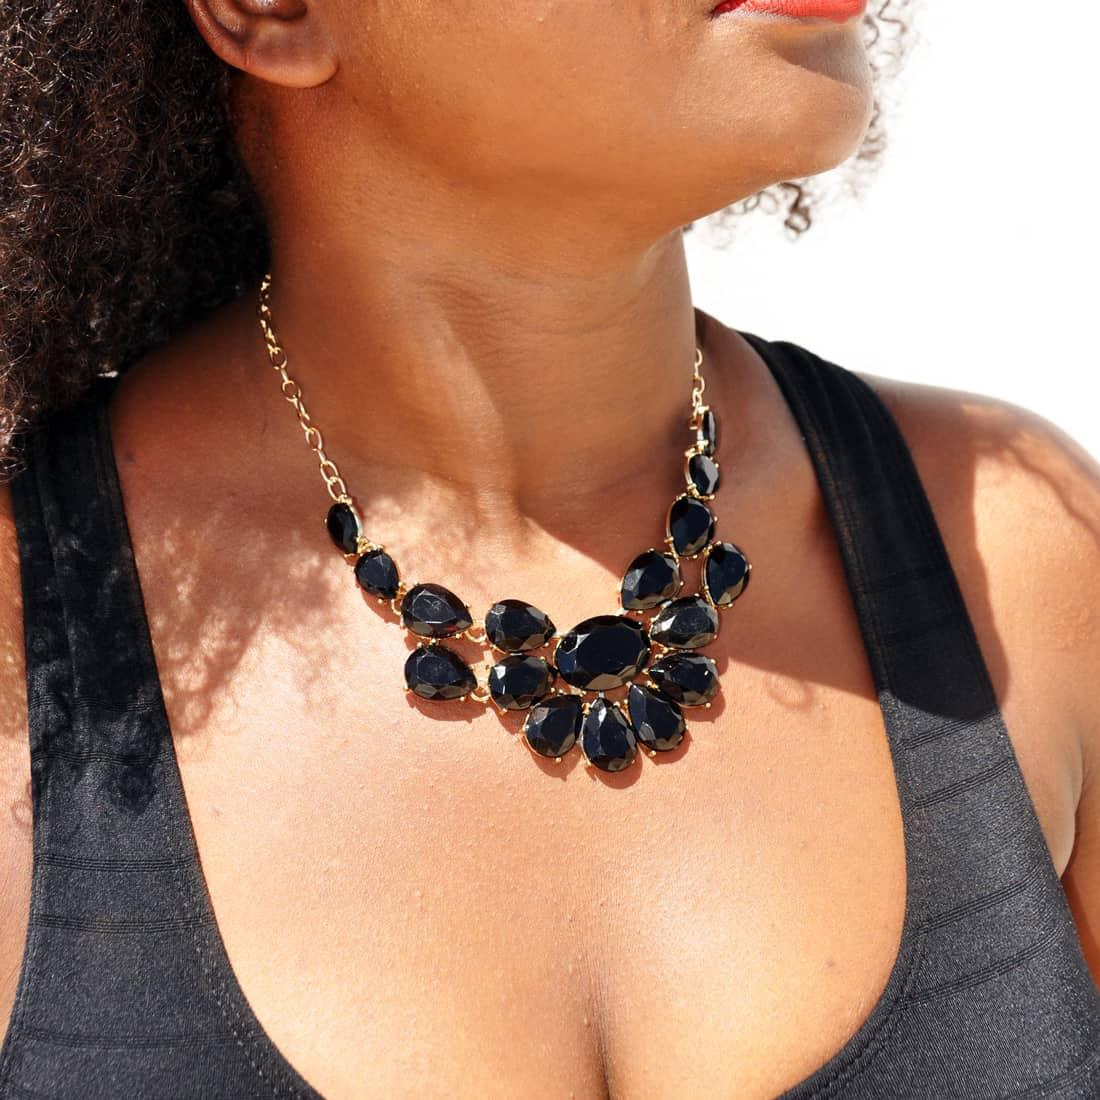 M0298 black6 Jewelry Accessories Necklaces Chokers maureens.com boutique